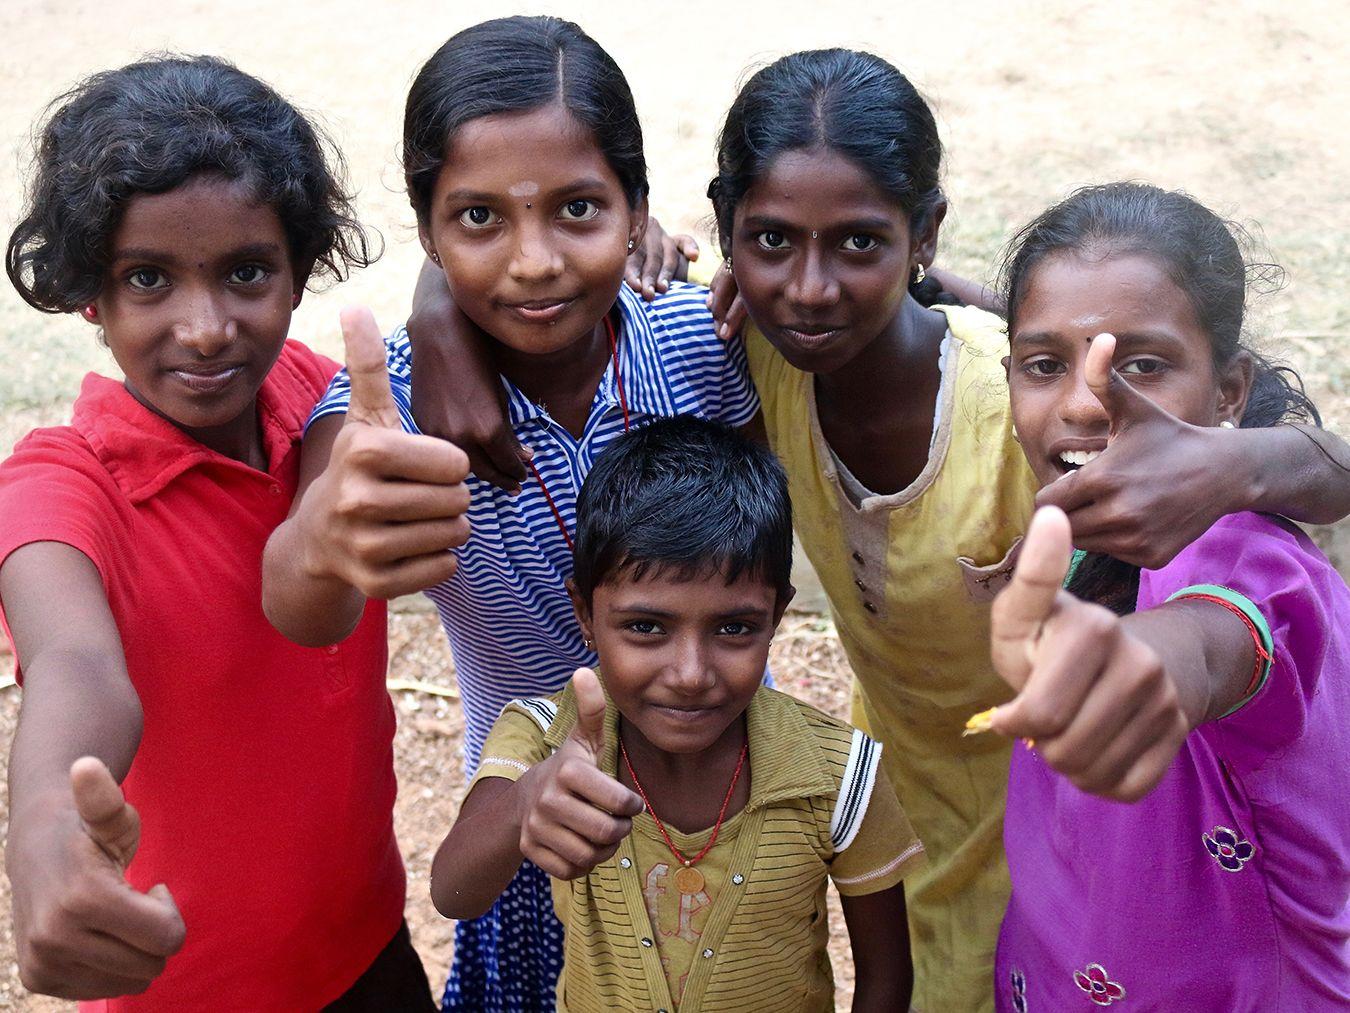 Group Sri Lankan school girls smiling